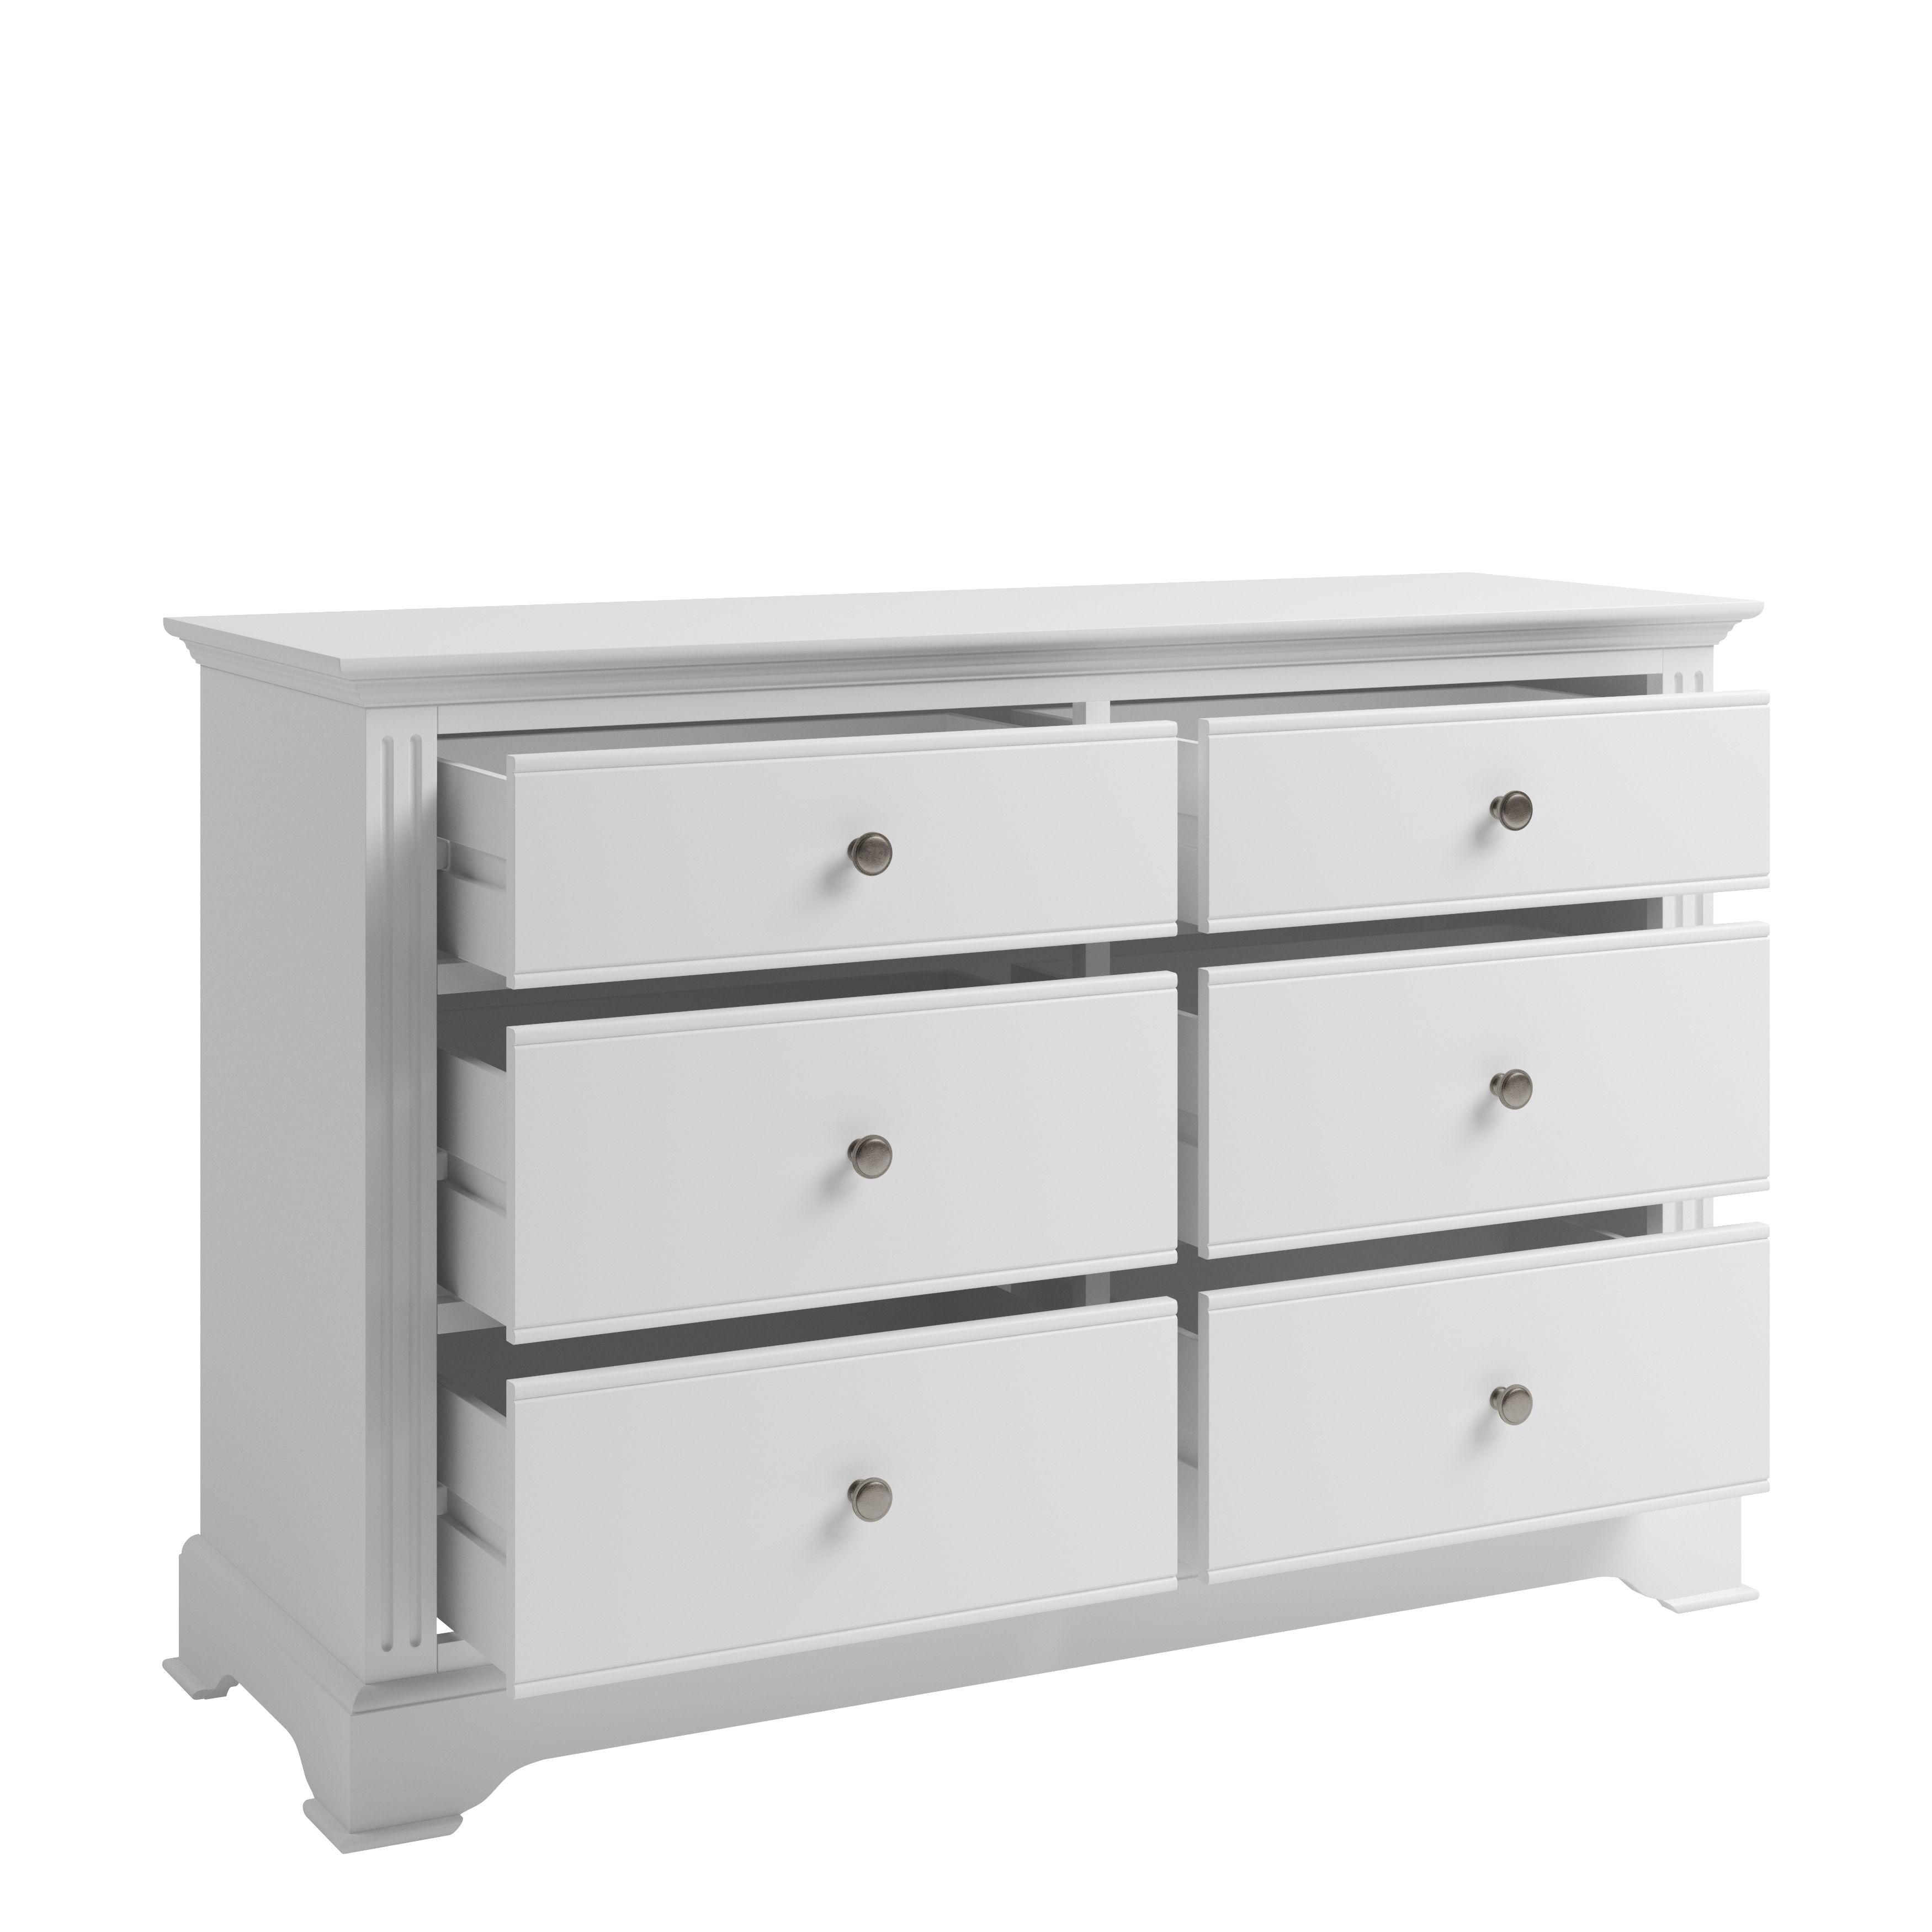 EIFFLE WHITE - 6 Drawer Chest